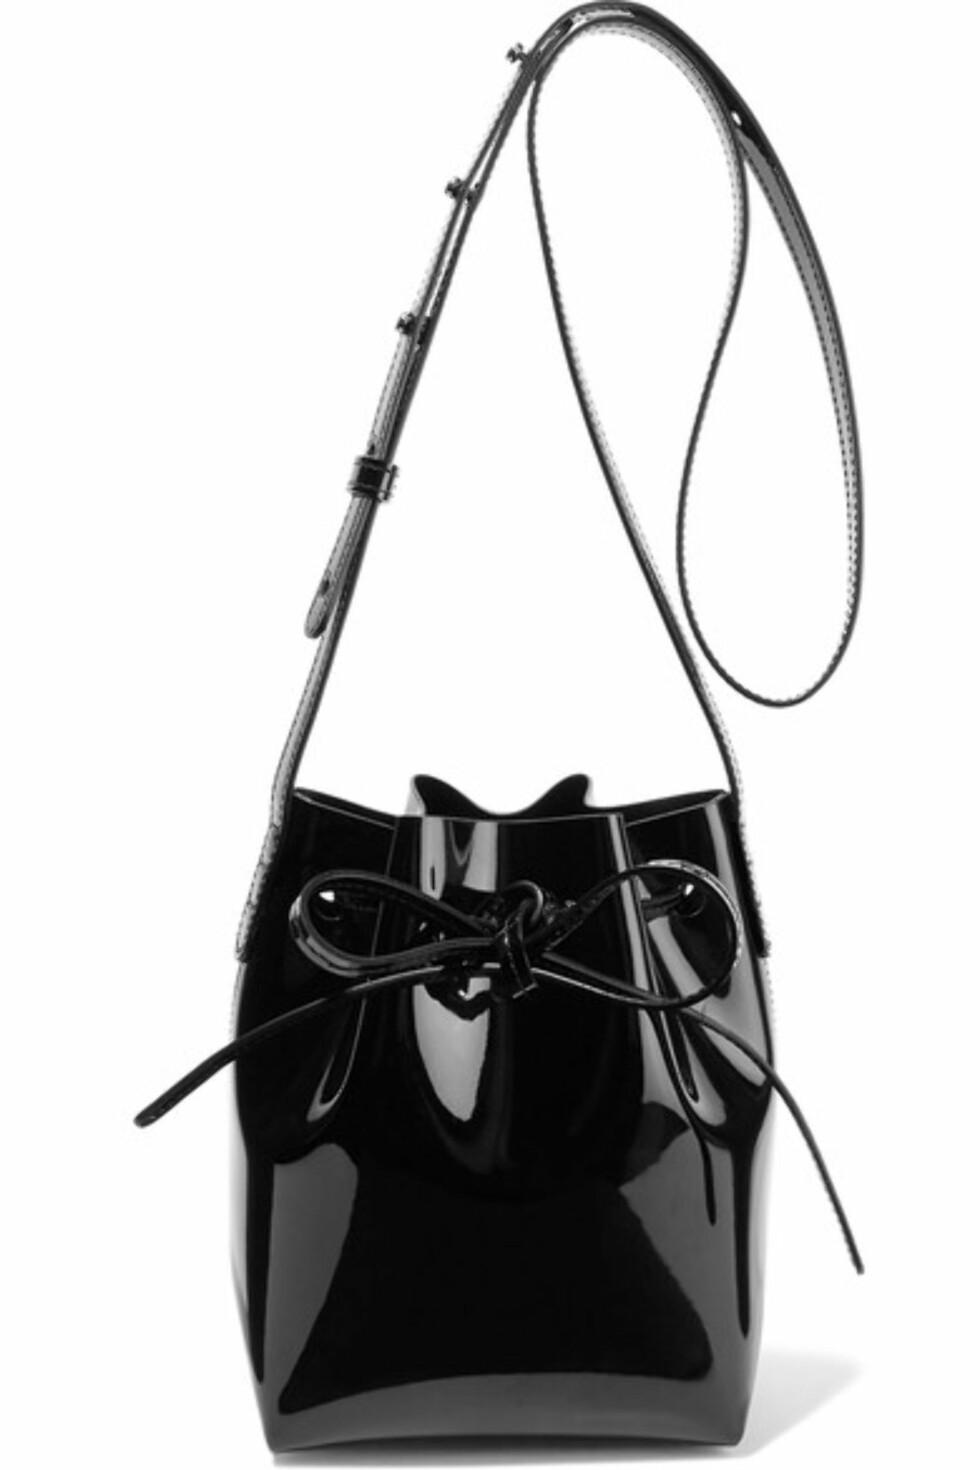 Bucket bag fra Mansur Gavriel via Net-a-porter.com | kr 3078 | https://www.net-a-porter.com/no/en/product/756416/Mansur_Gavriel/mini-mini-patent-leather-bucket-bag-